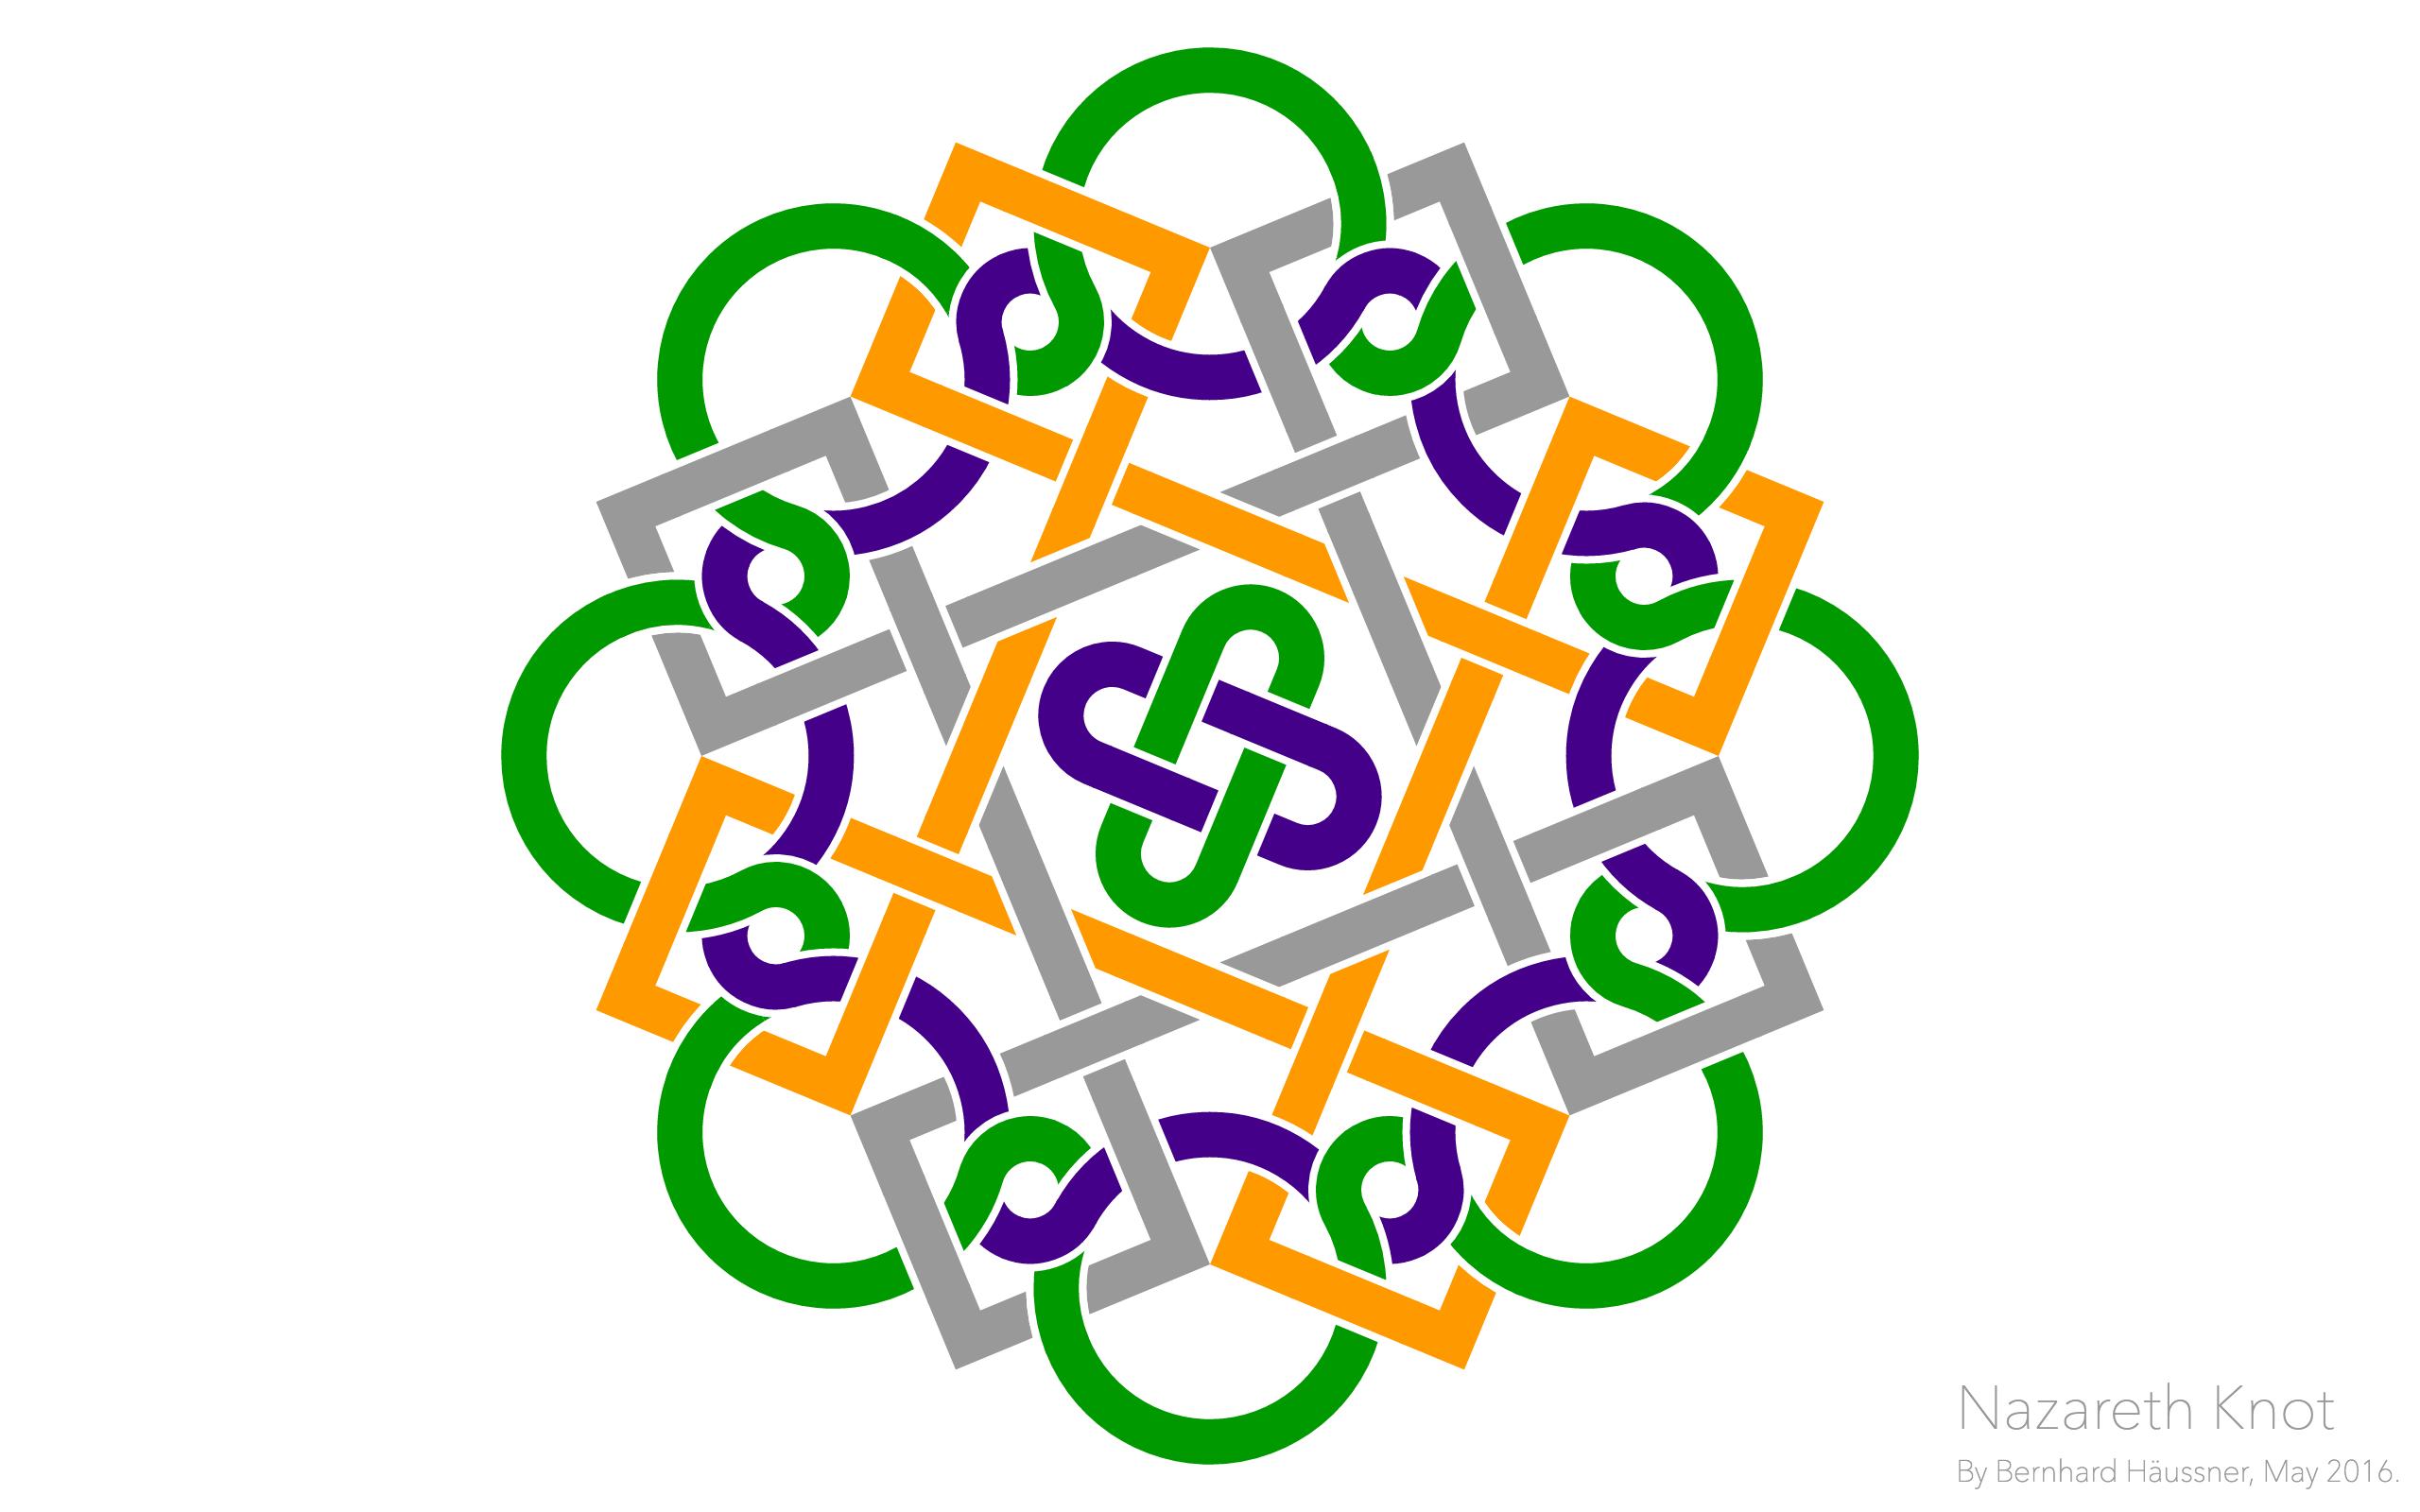 The Nazareth Knot